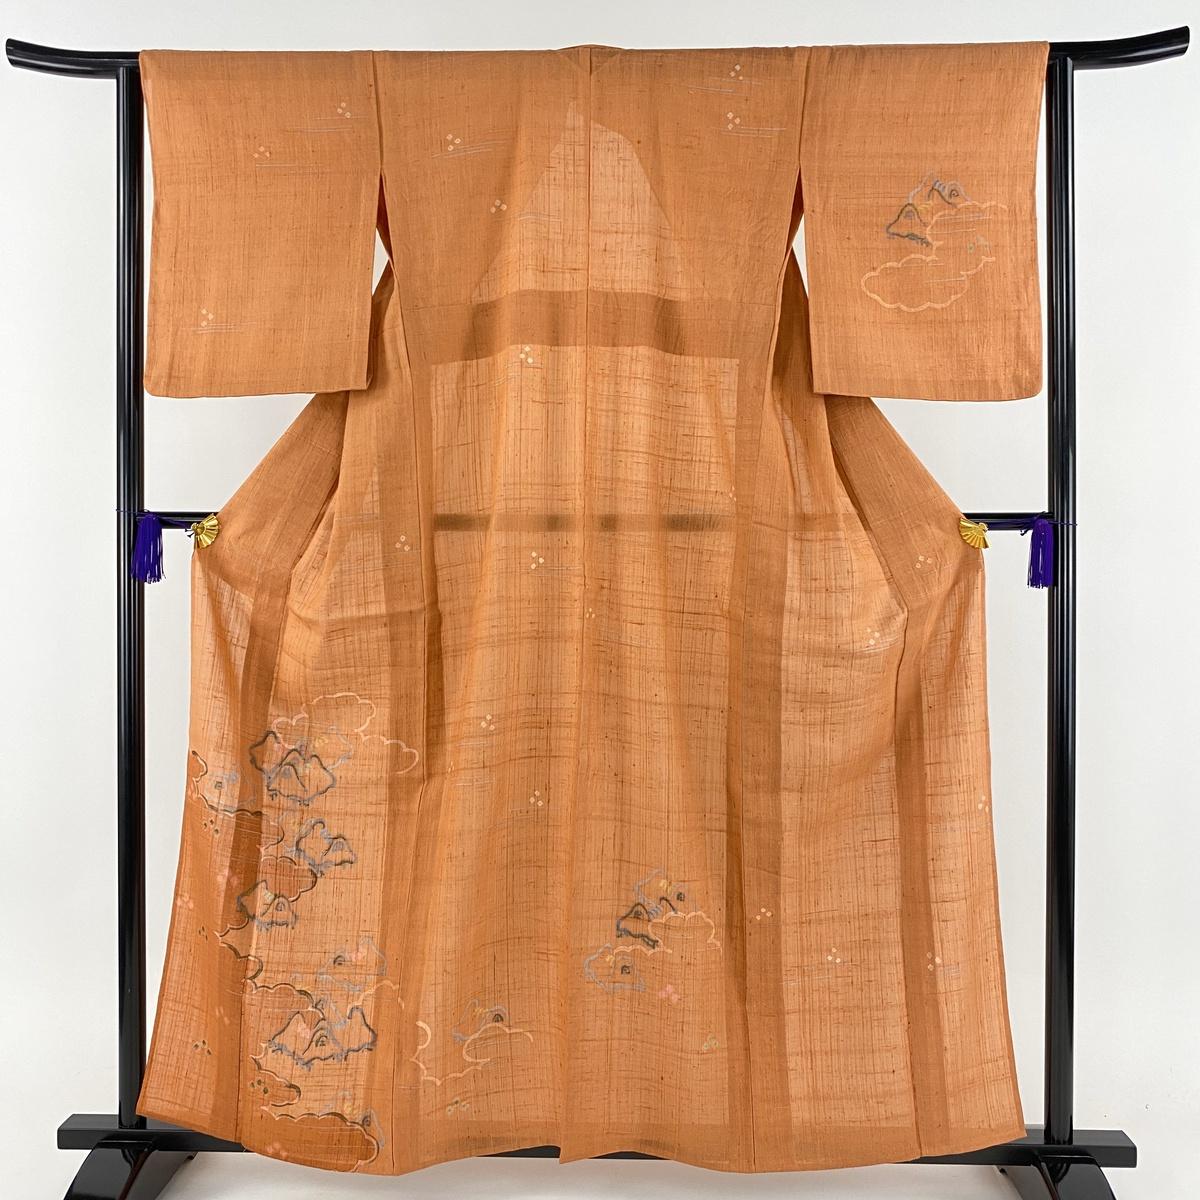 付下げ 美品 名品 紬地 雲文 幾何学 金彩 オレンジ 単衣 身丈160cm 裄丈63.5cm S 正絹 【中古】